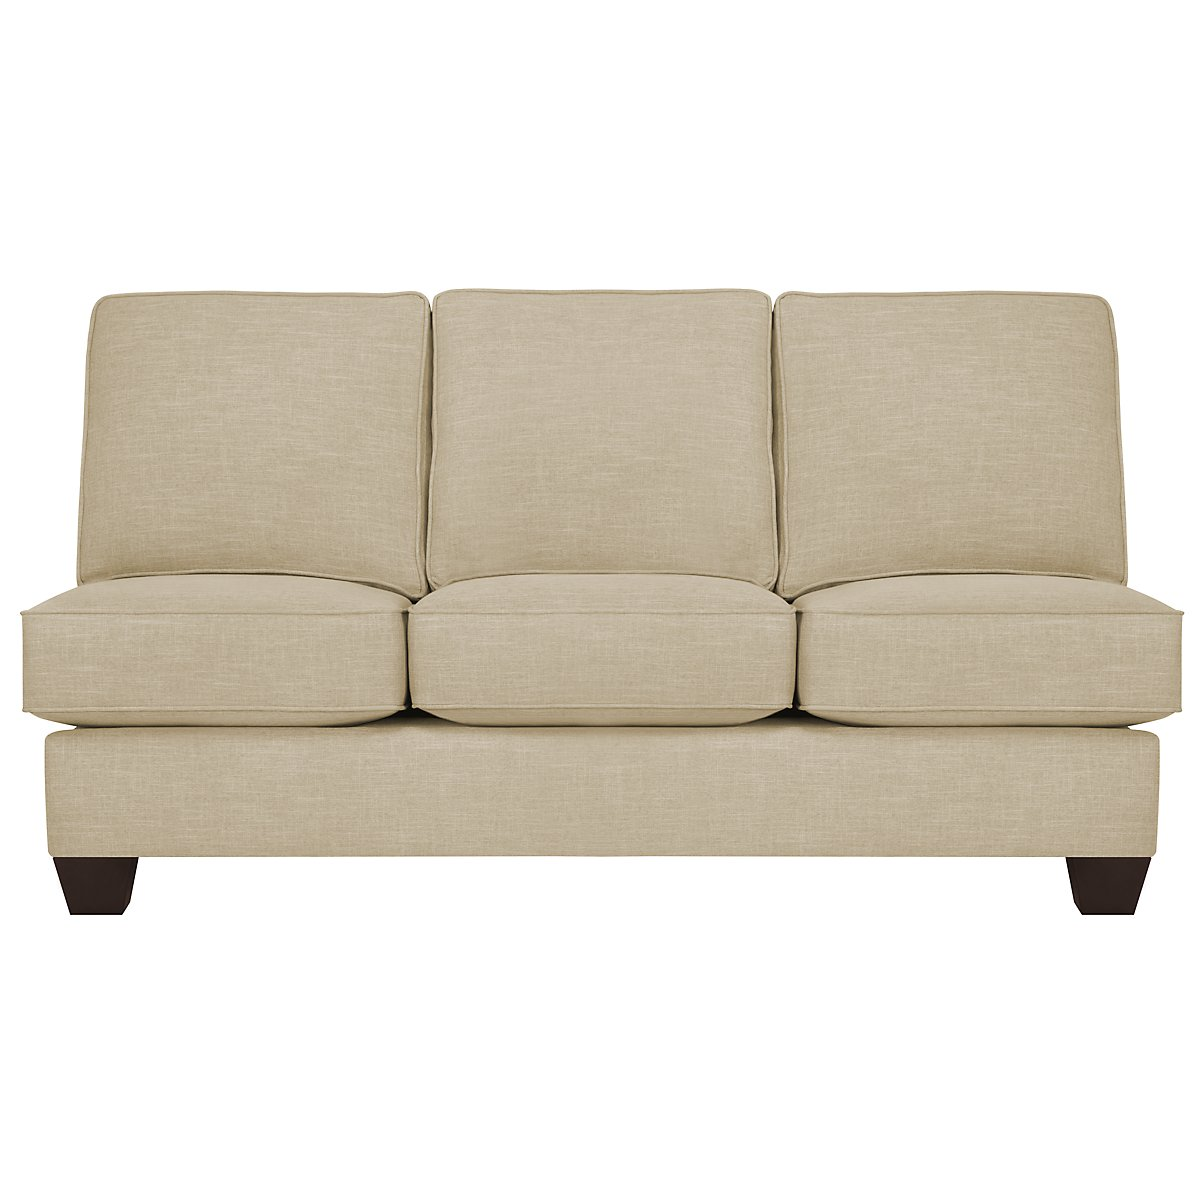 City Furniture York Beige Fabric Large Left Cuddler